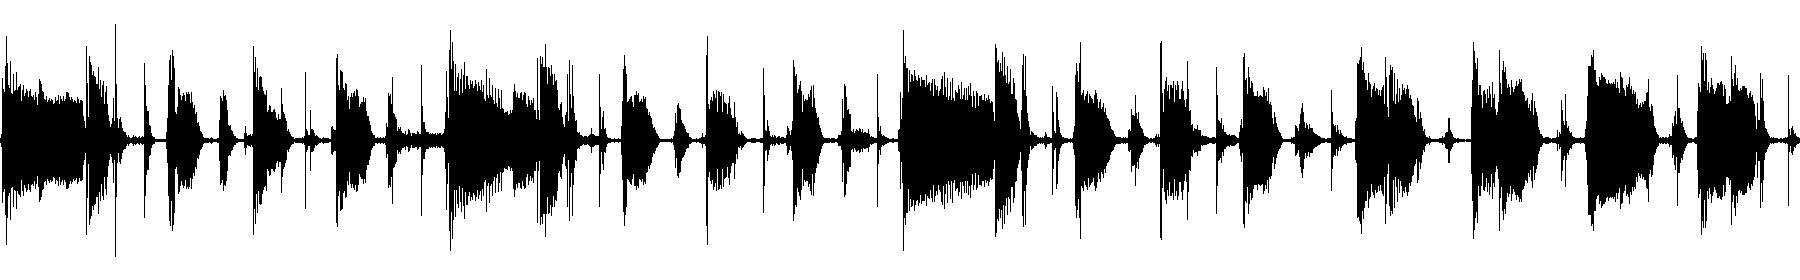 guitarblues16 130